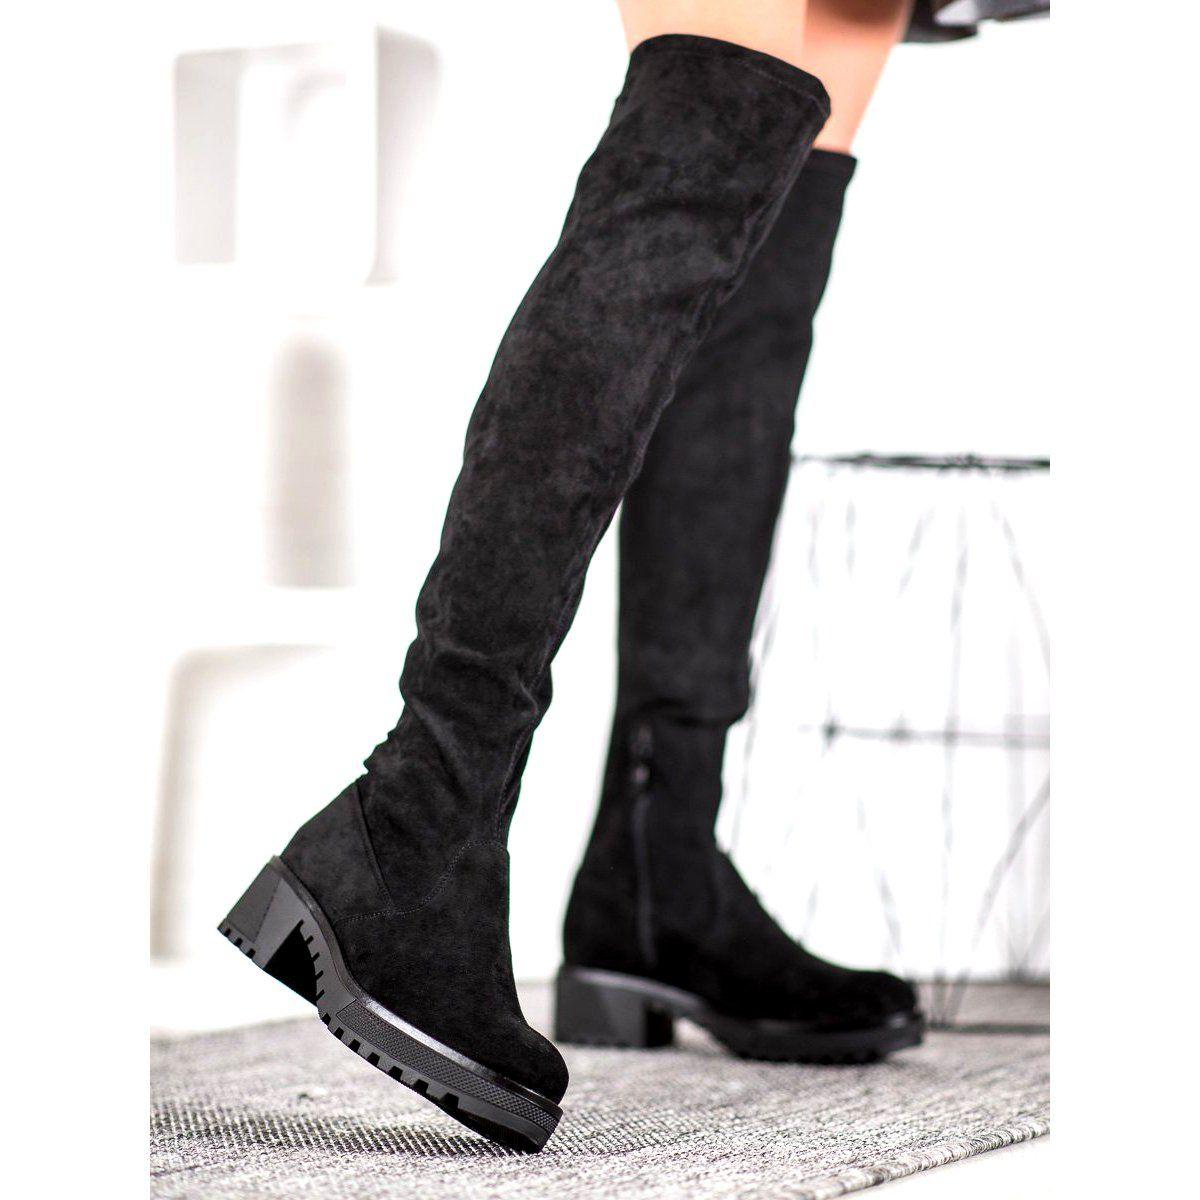 Sds Zamszowe Muszkieterki Na Platformie Czarne Over Knee Boot Boots Shoes